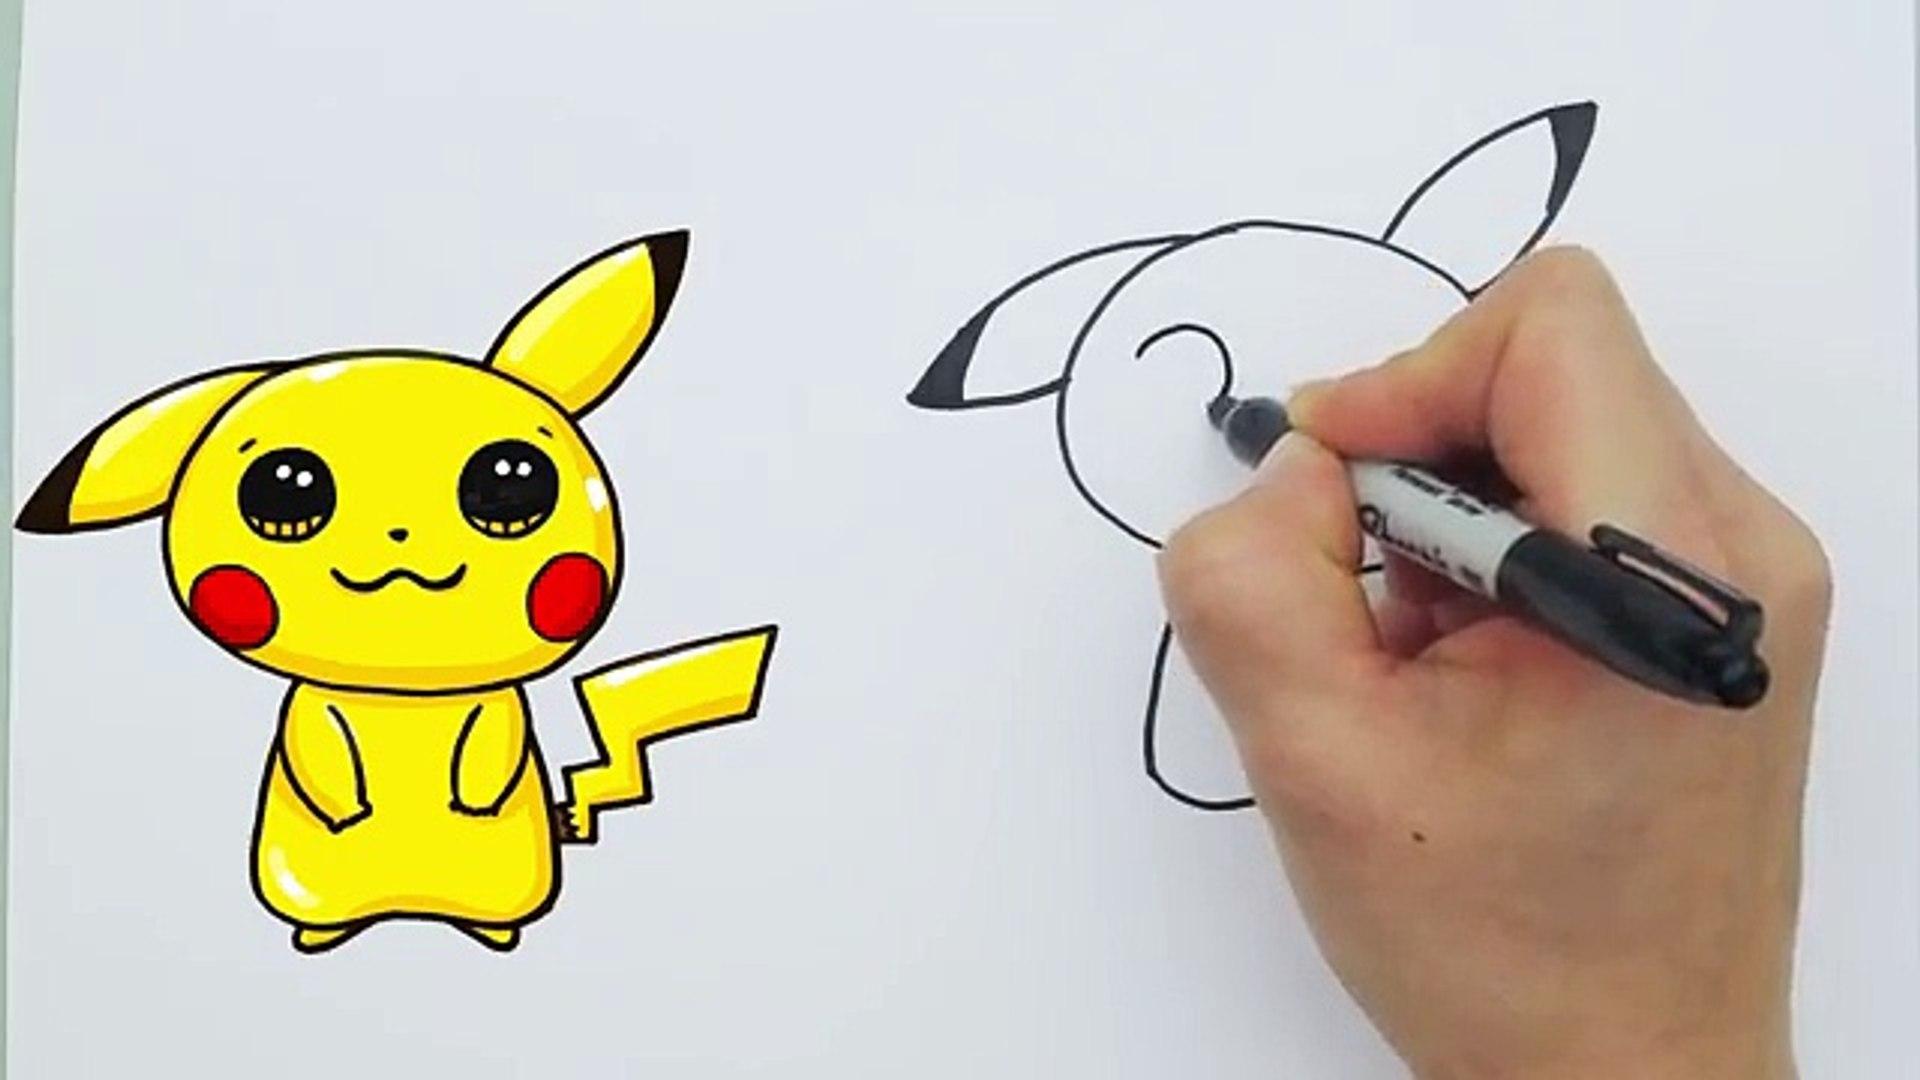 How To Draw Pokemon Go Pikachu Cute Step By Step Easy